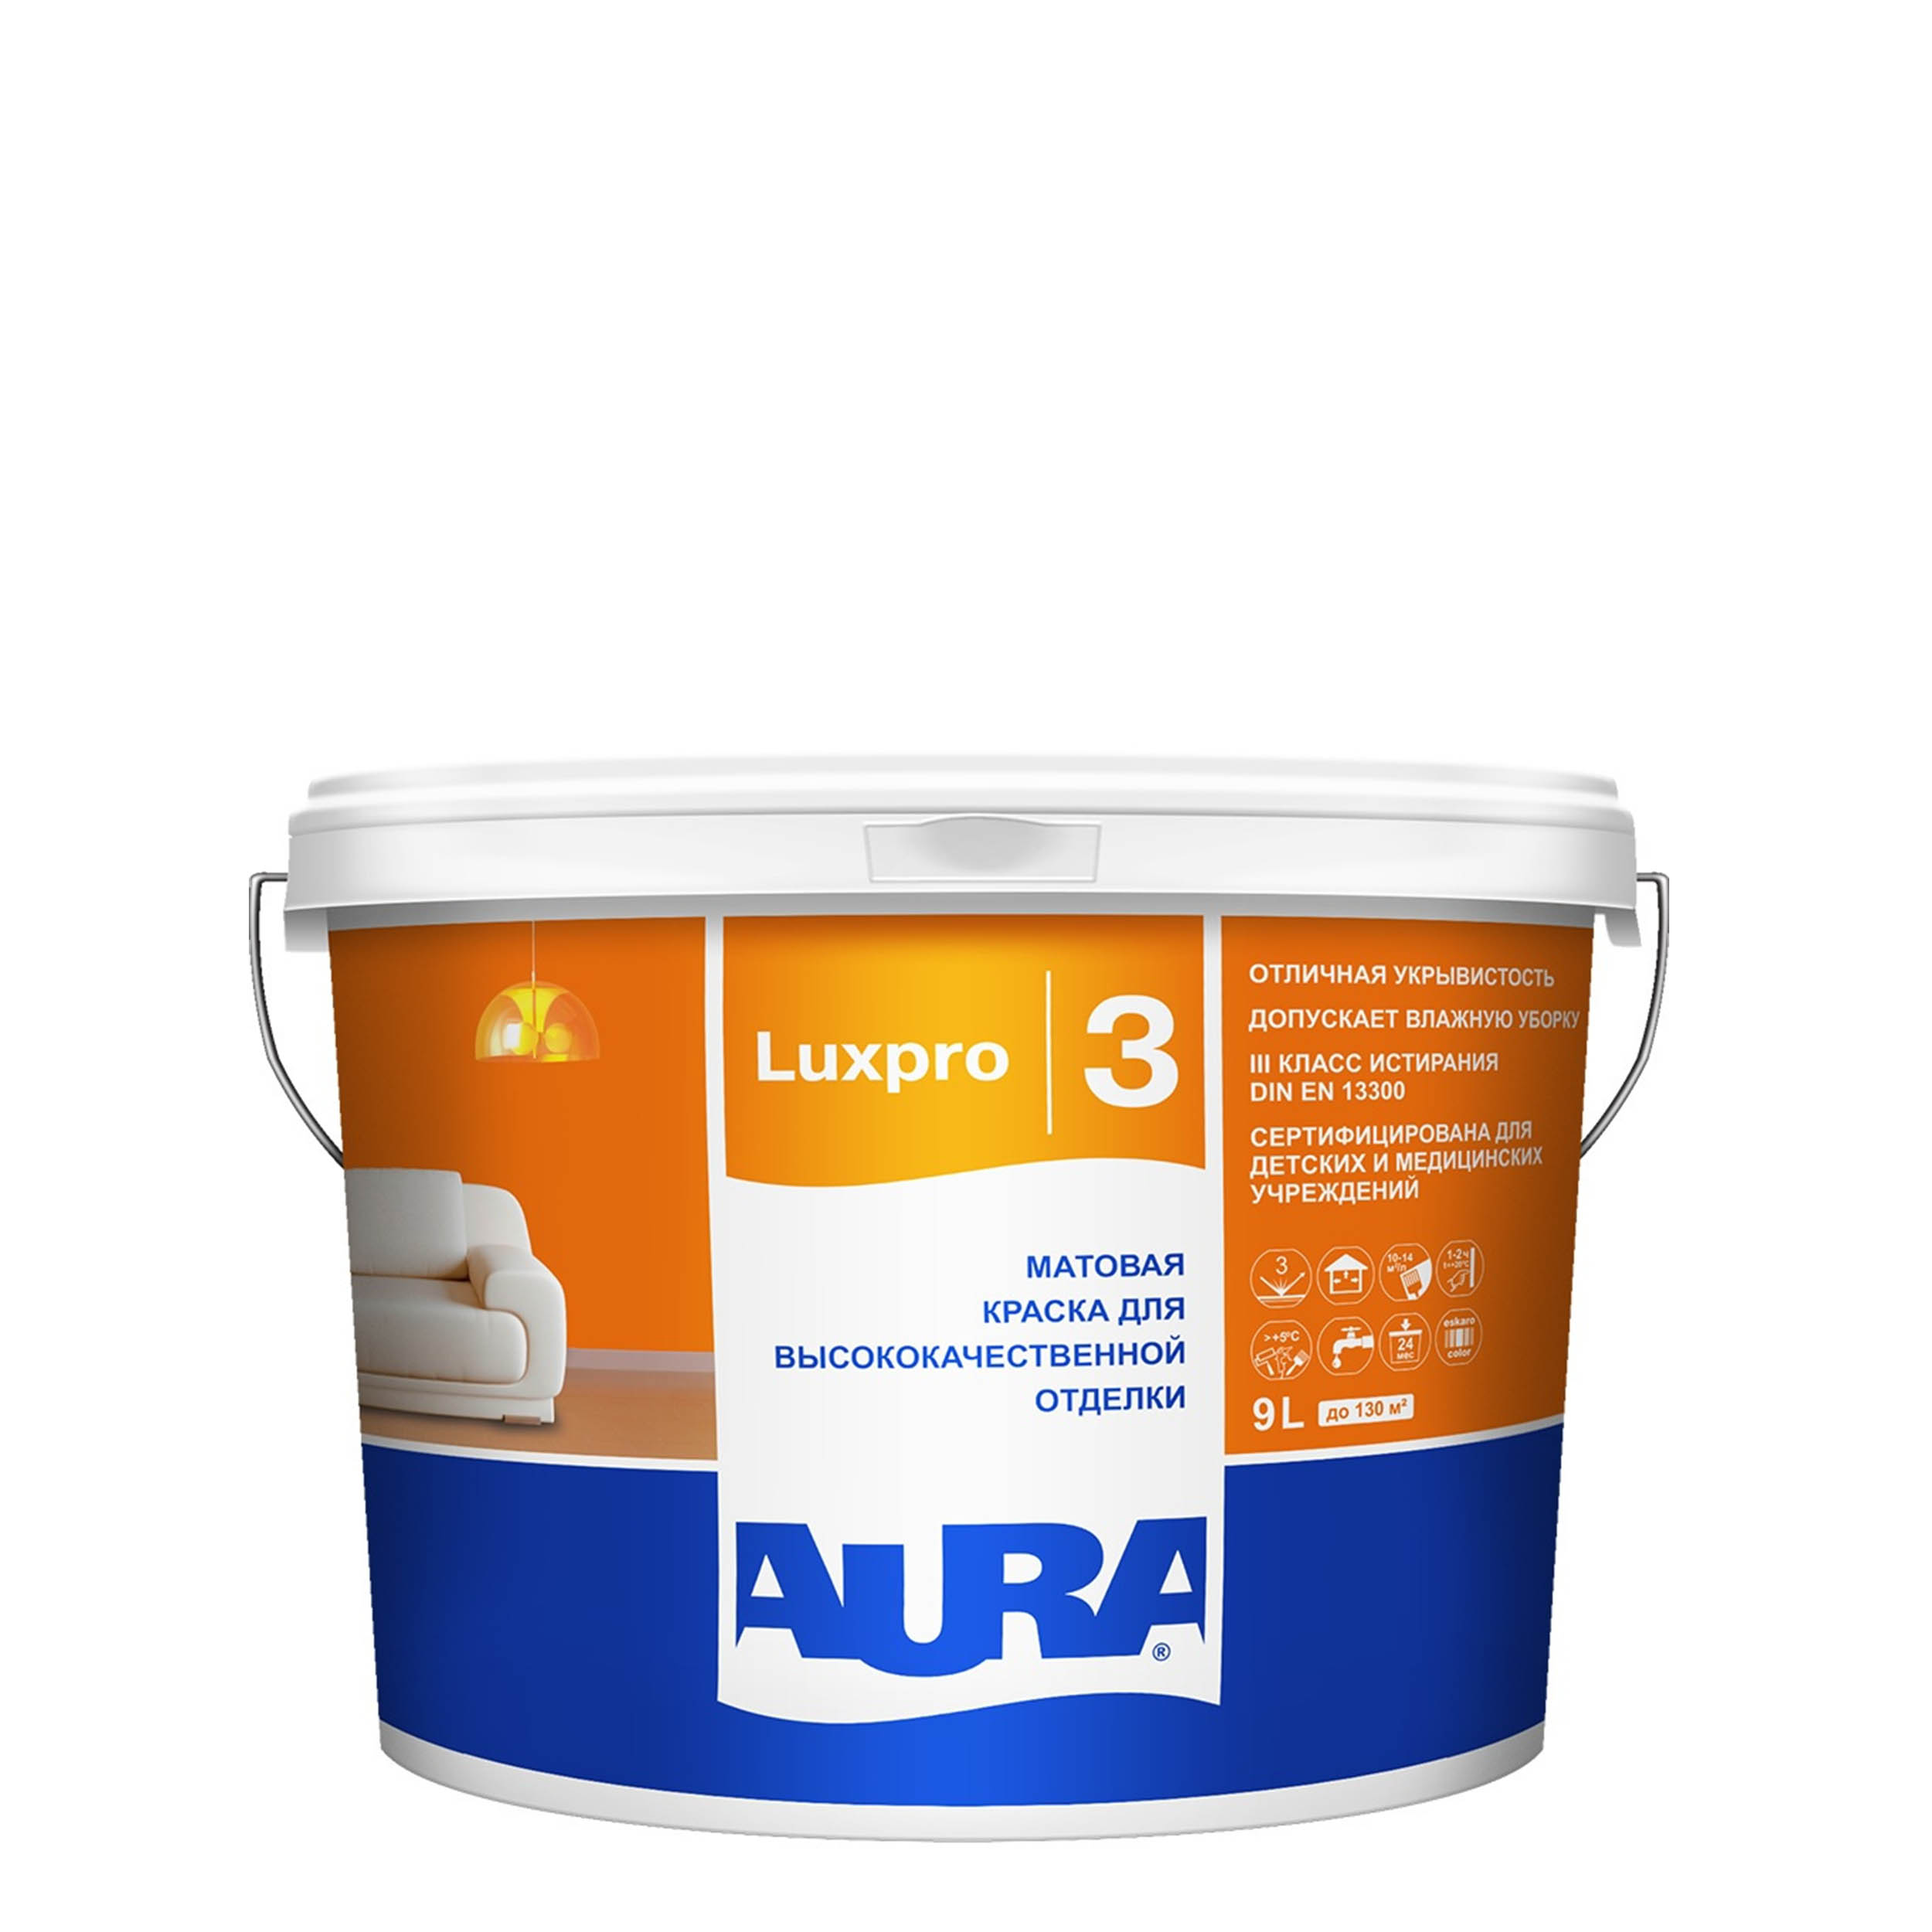 Фото 3 - Краска интерьерная, Aura LuxPRO 3, RAL 1011, 11 кг.